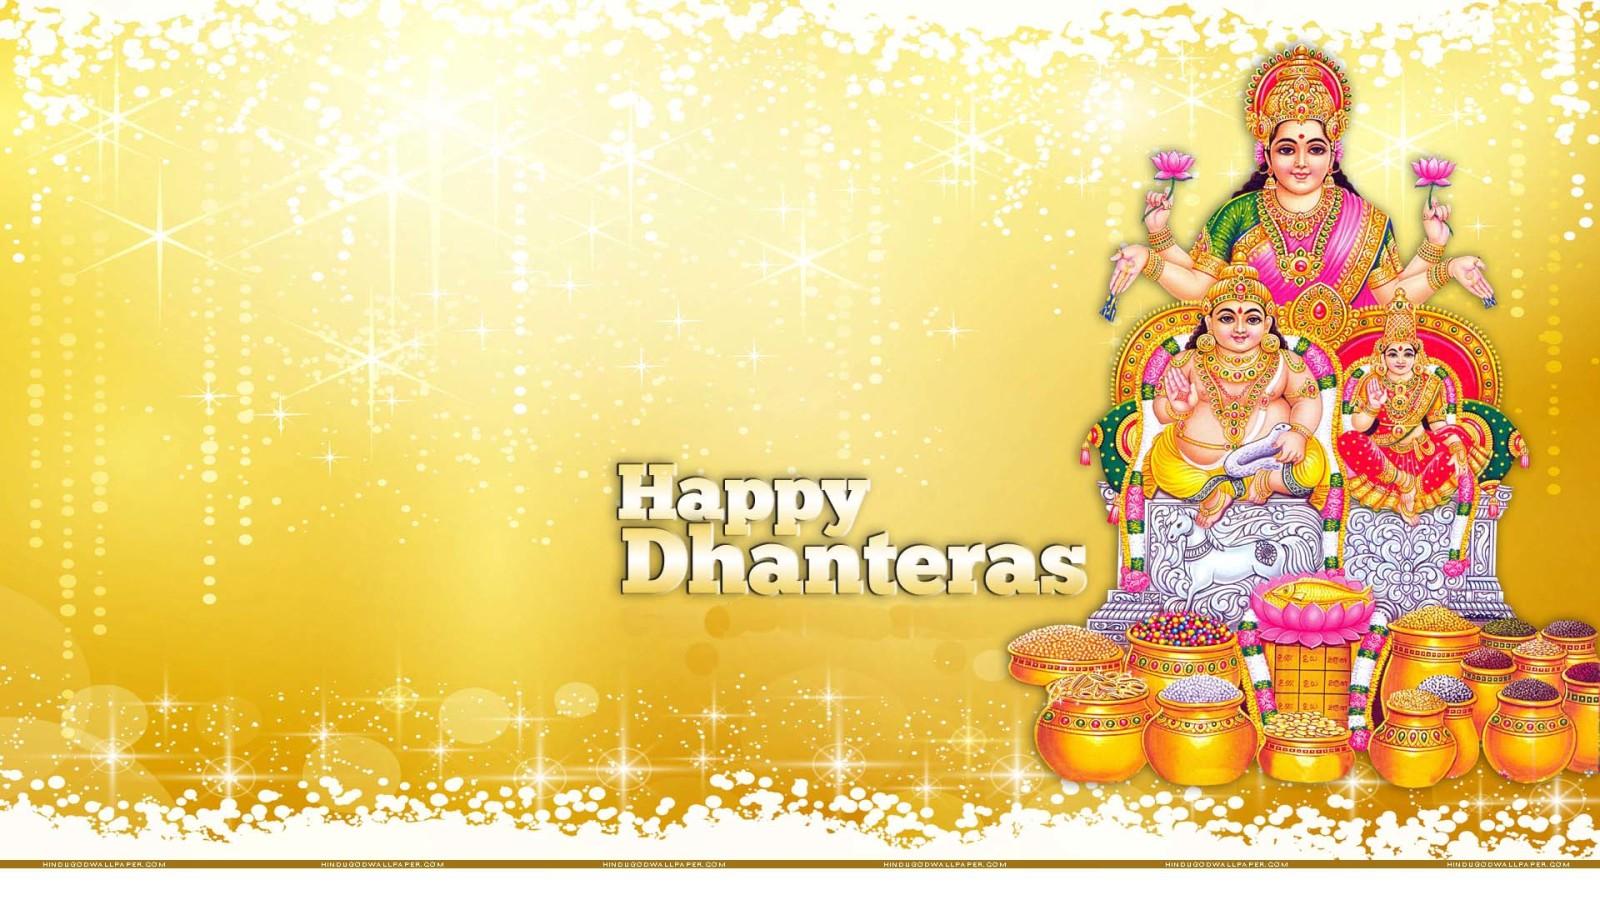 Happy Dhanteras Lakshmi Mata And God Kuber Wallpaper 1600x900